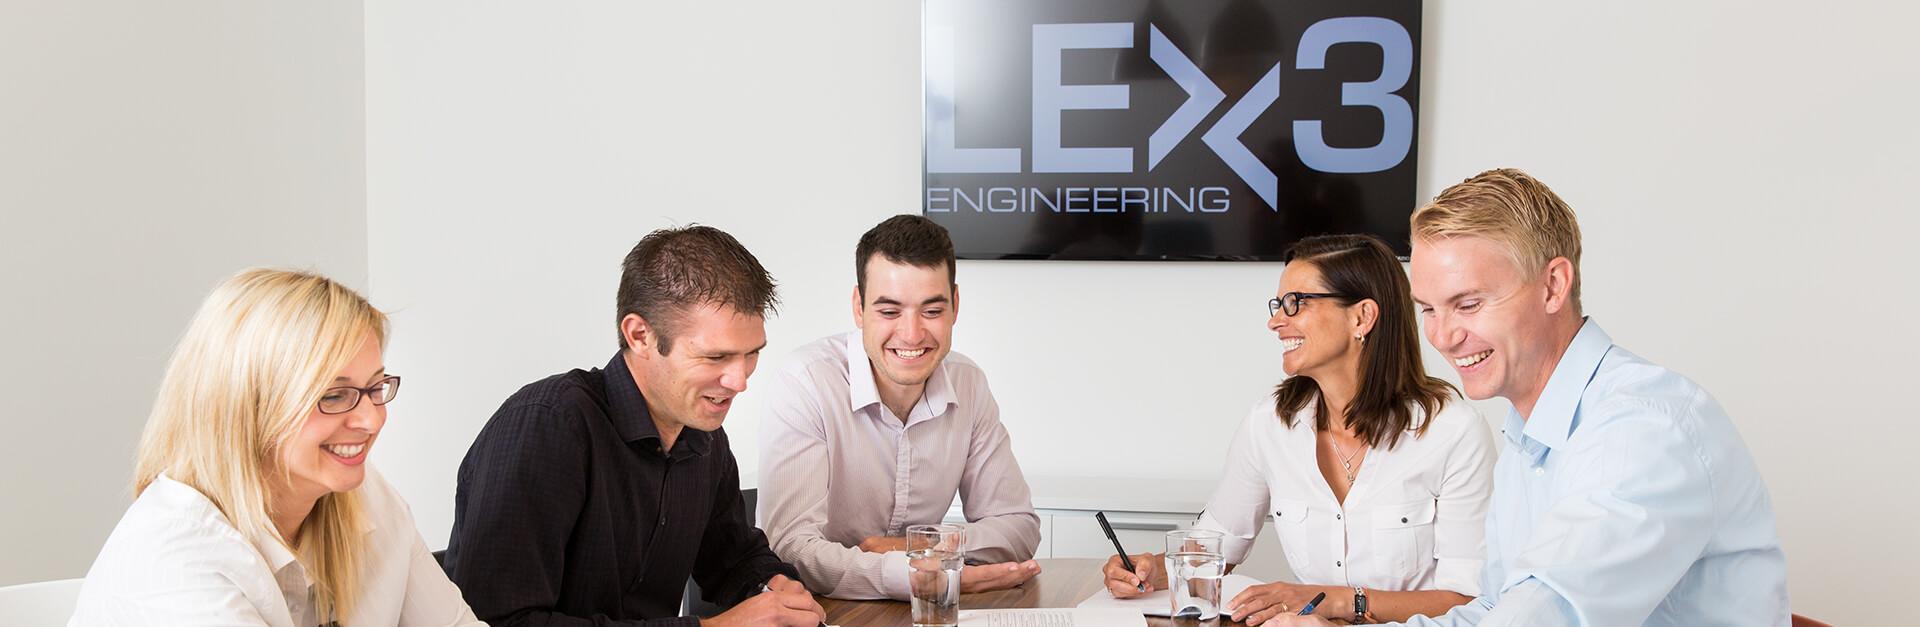 LEX3 Engineering